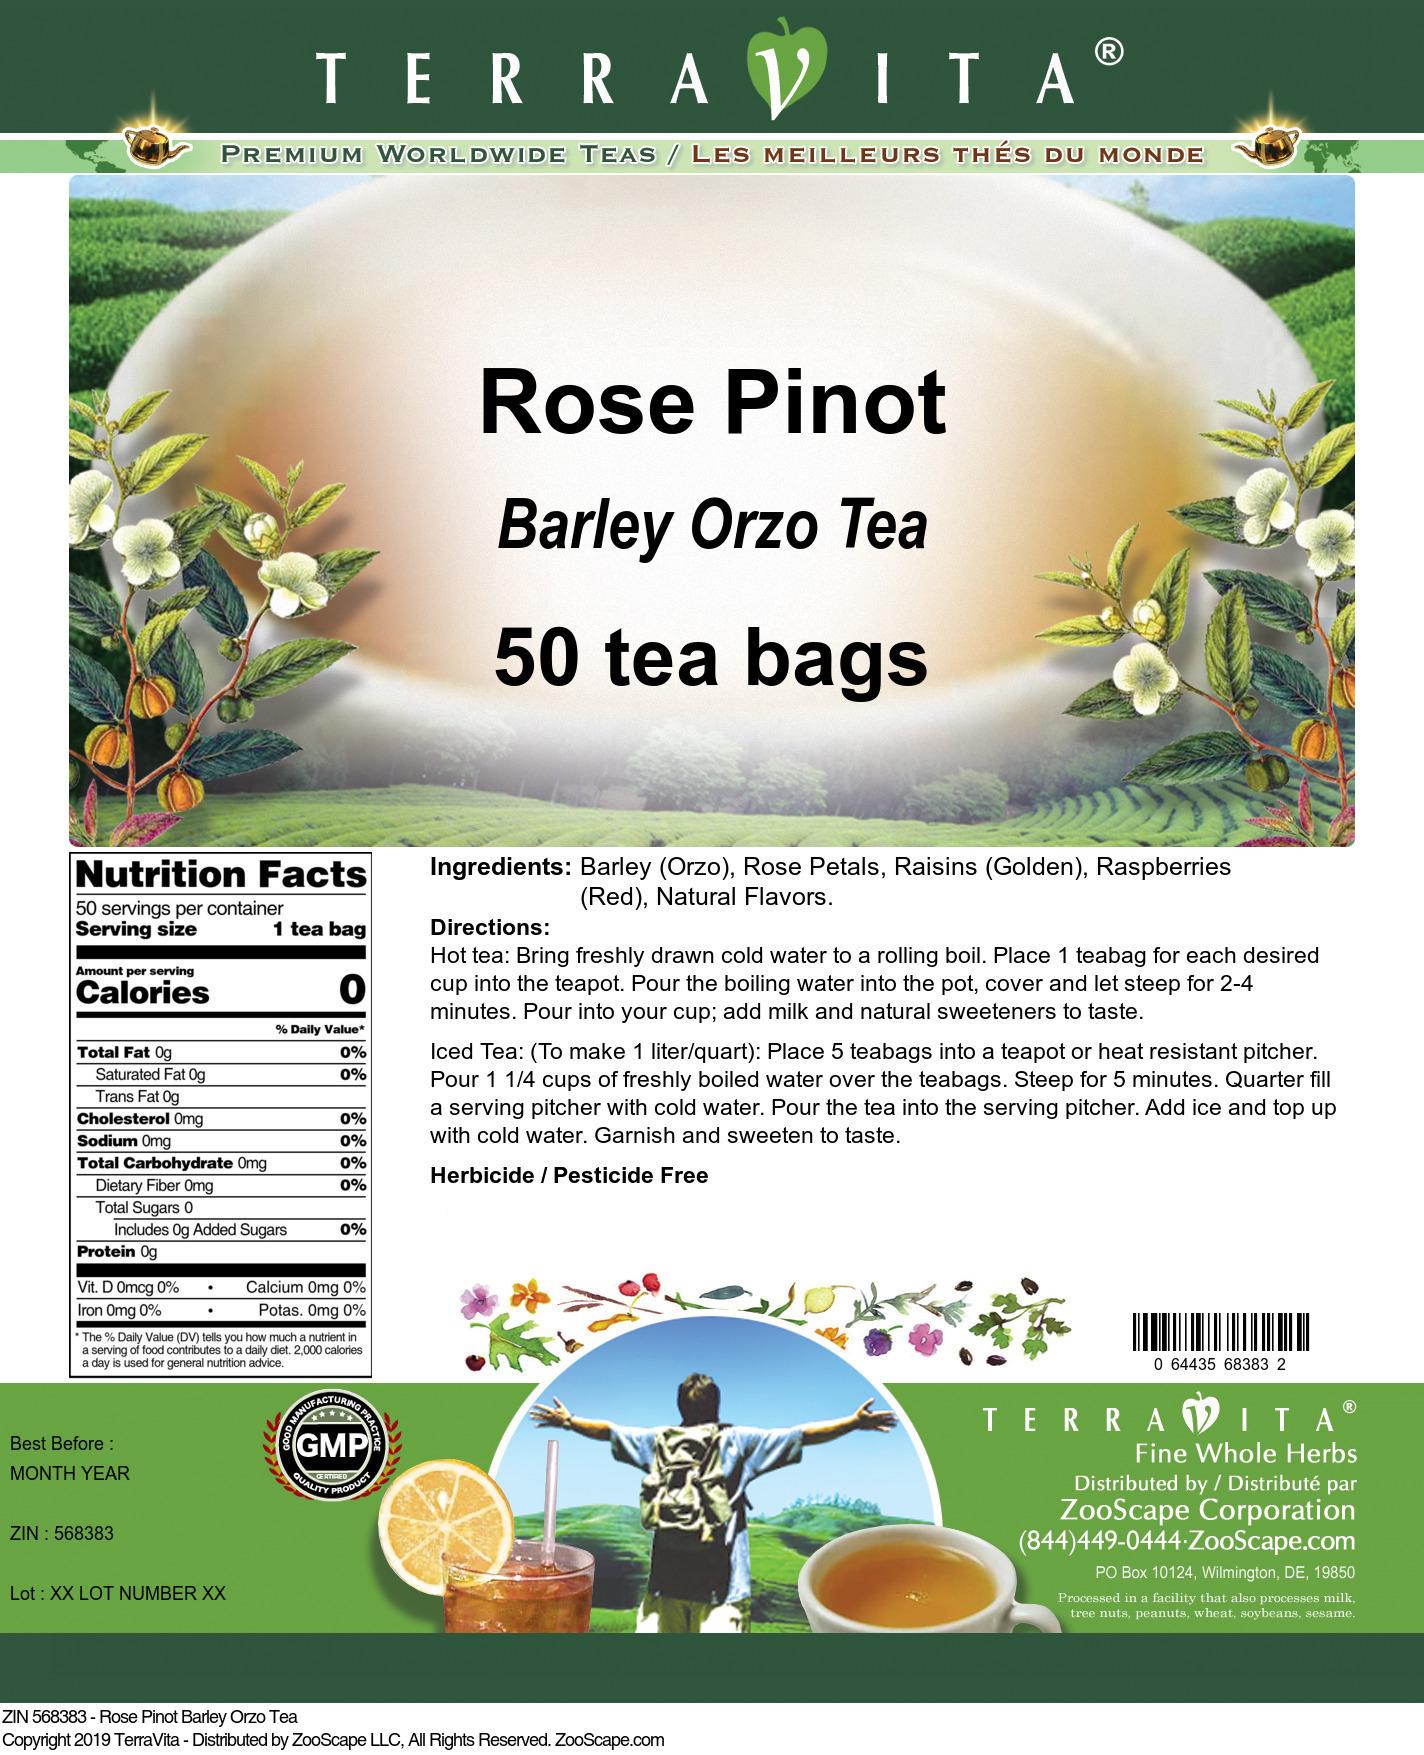 Rose Pinot Barley Orzo Tea